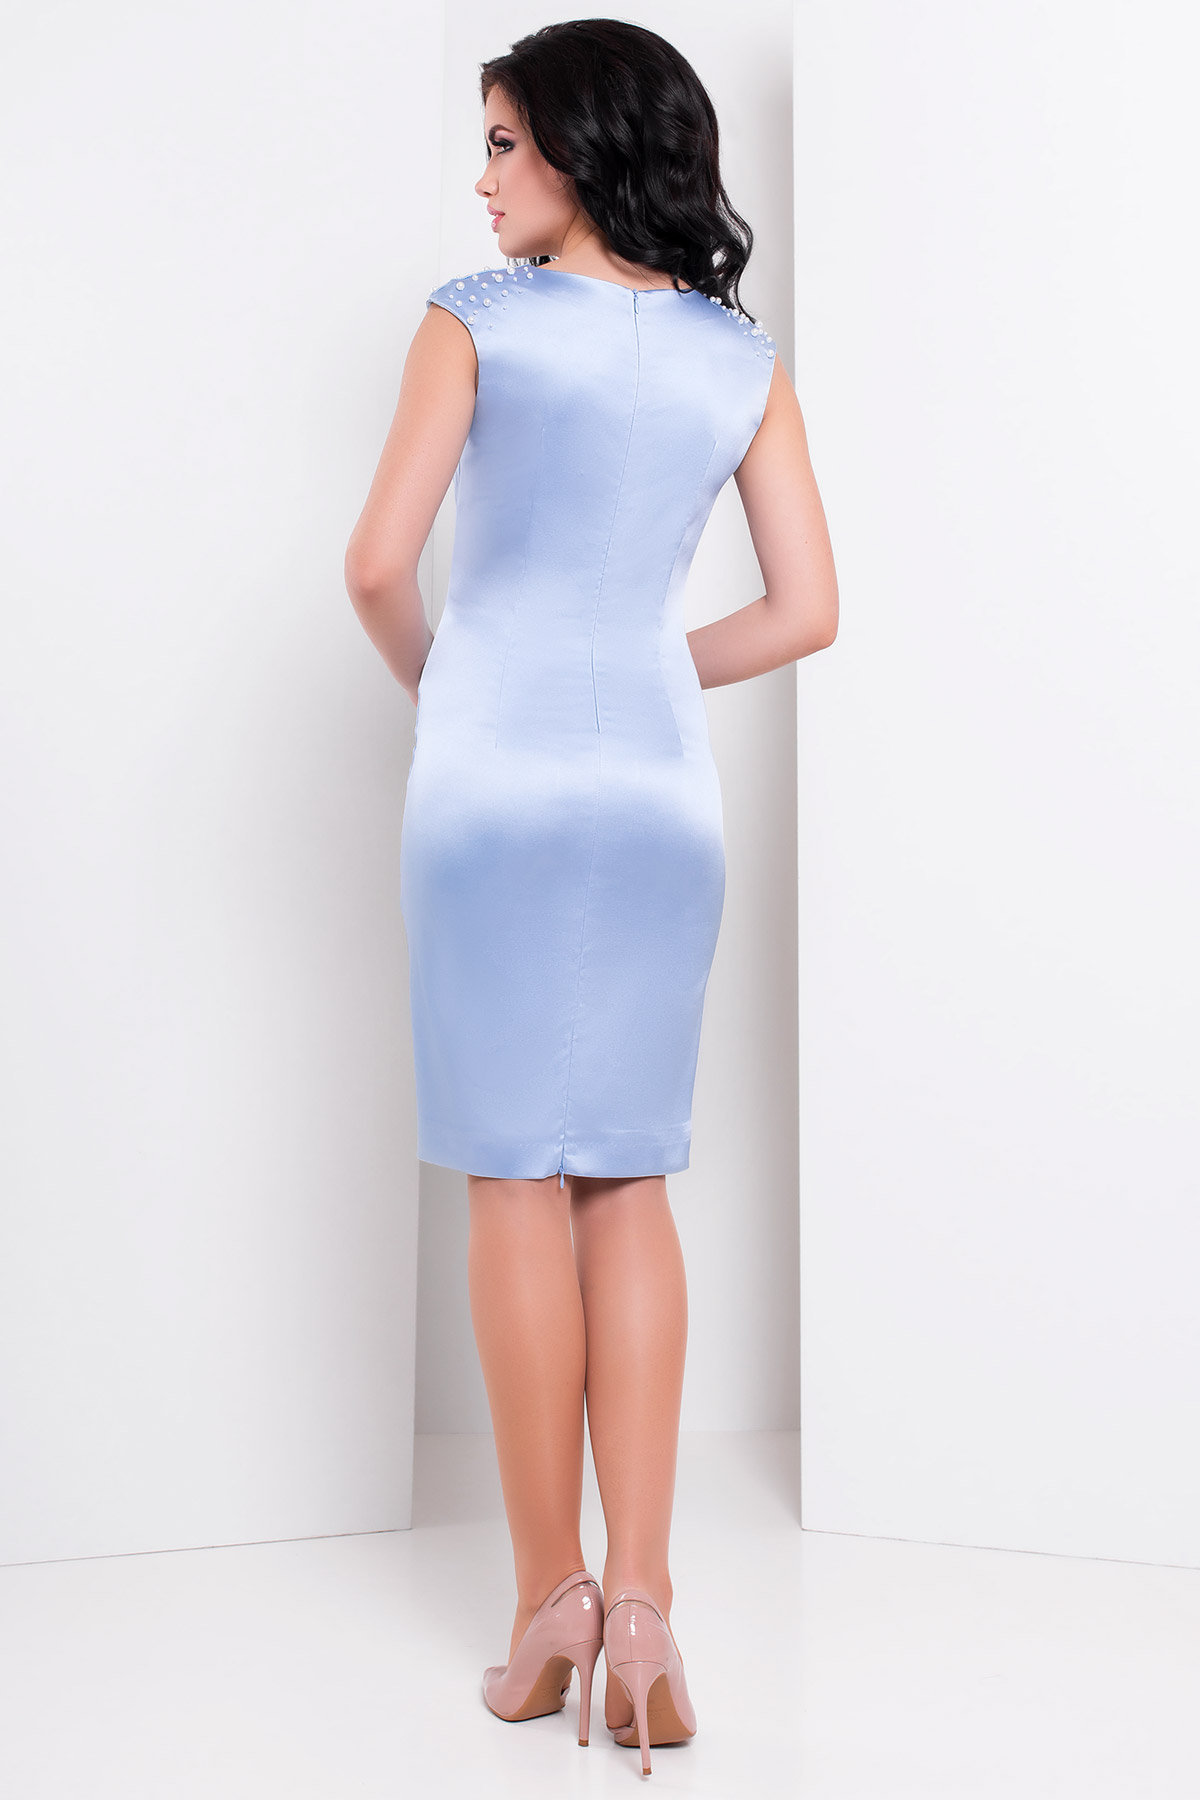 Платье Дарина 2964 Цвет: Голубой